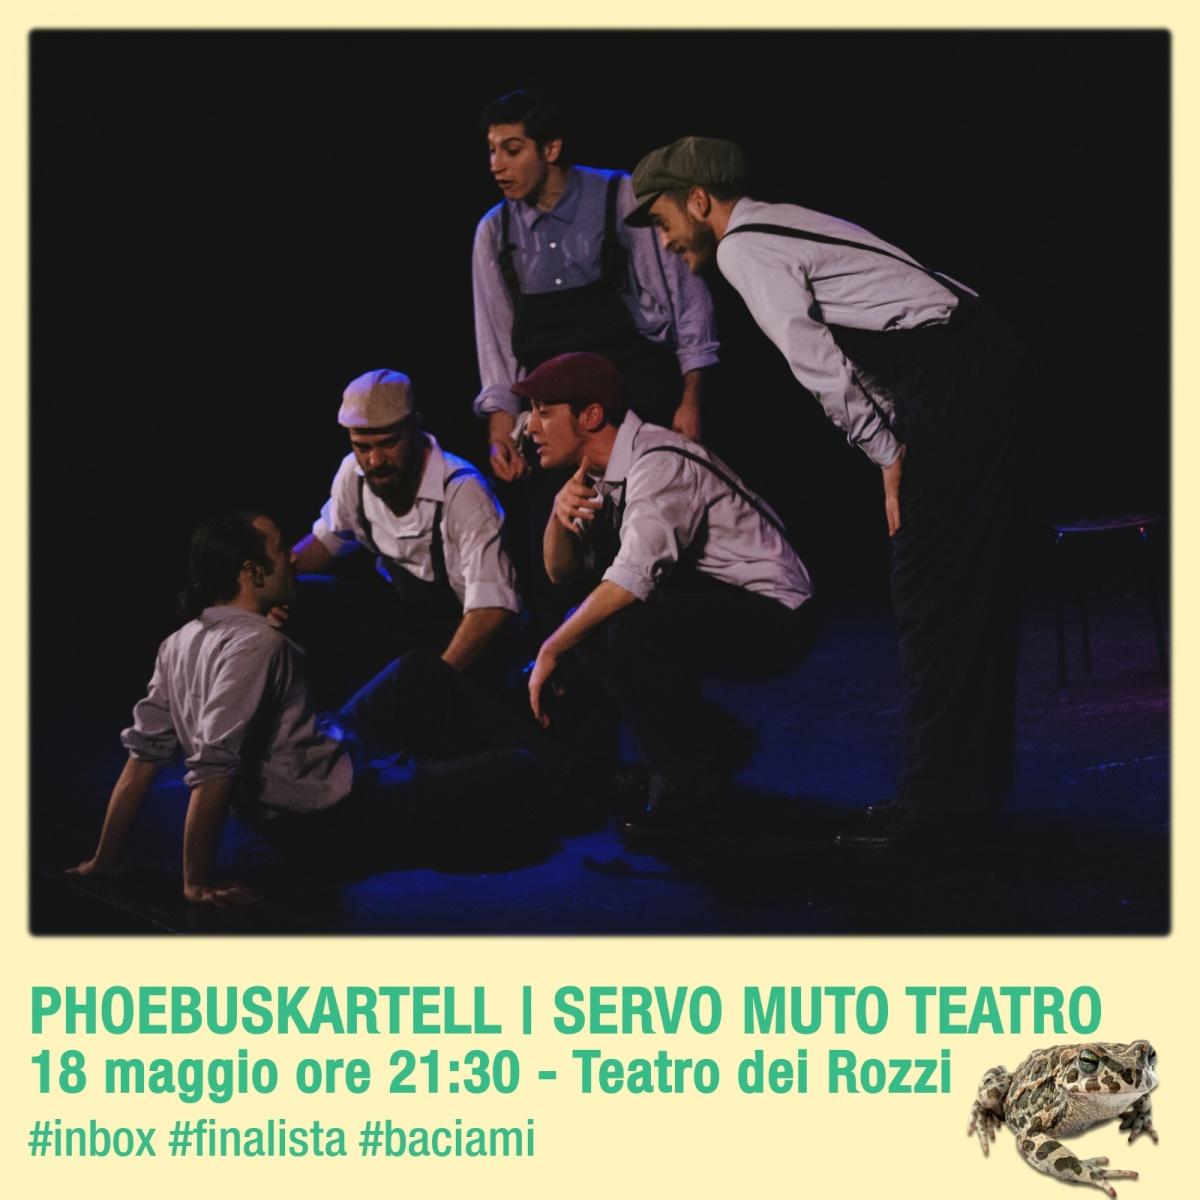 Finale IN BOX Siena: Phoebuskartell Servo Muto Teatro 18 maggio 21.30